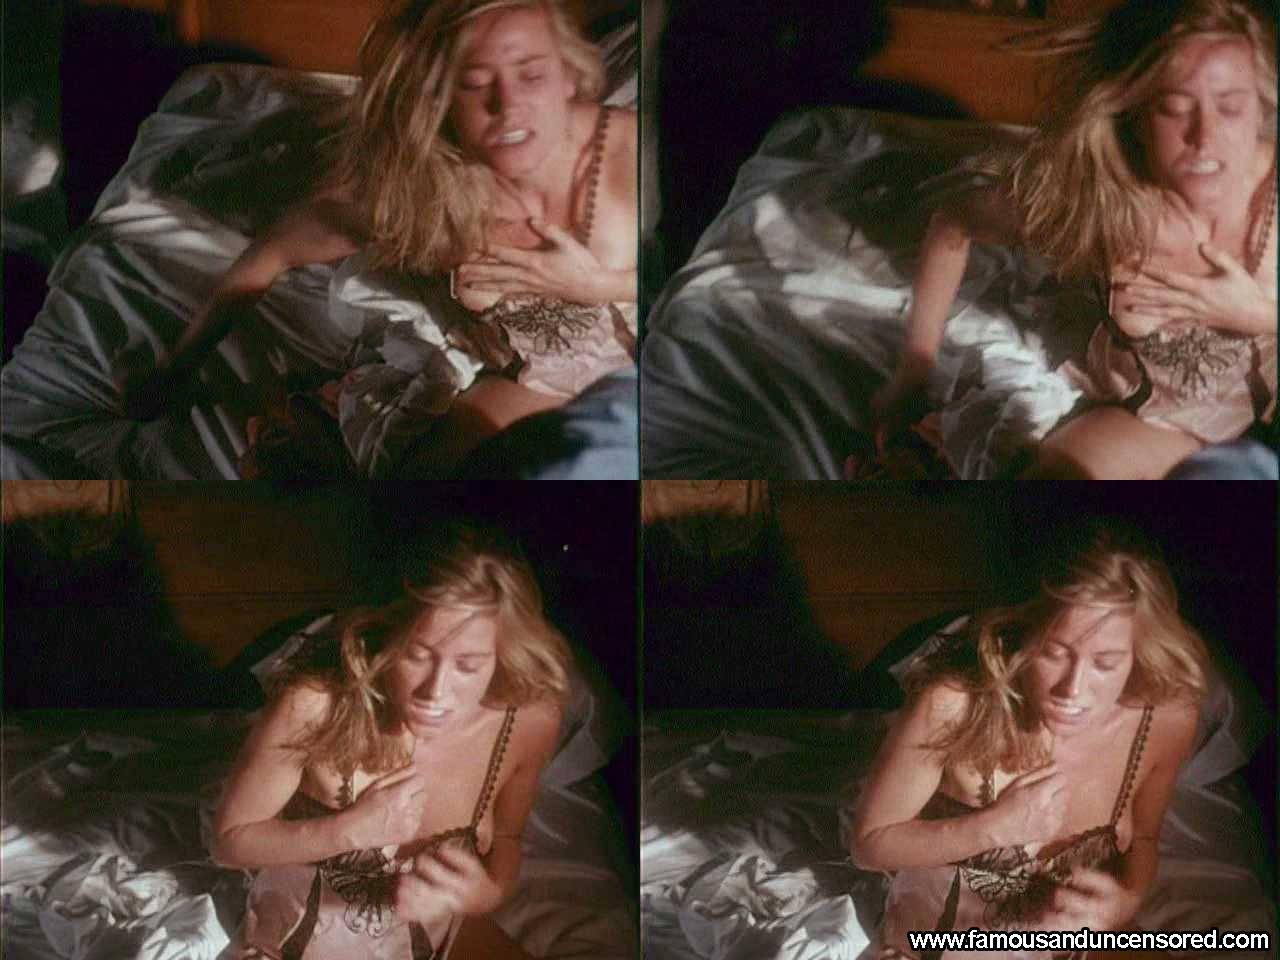 Actriz Porno Sierra Sanders showing xxx images for sierra mccormick fuck xxx   www